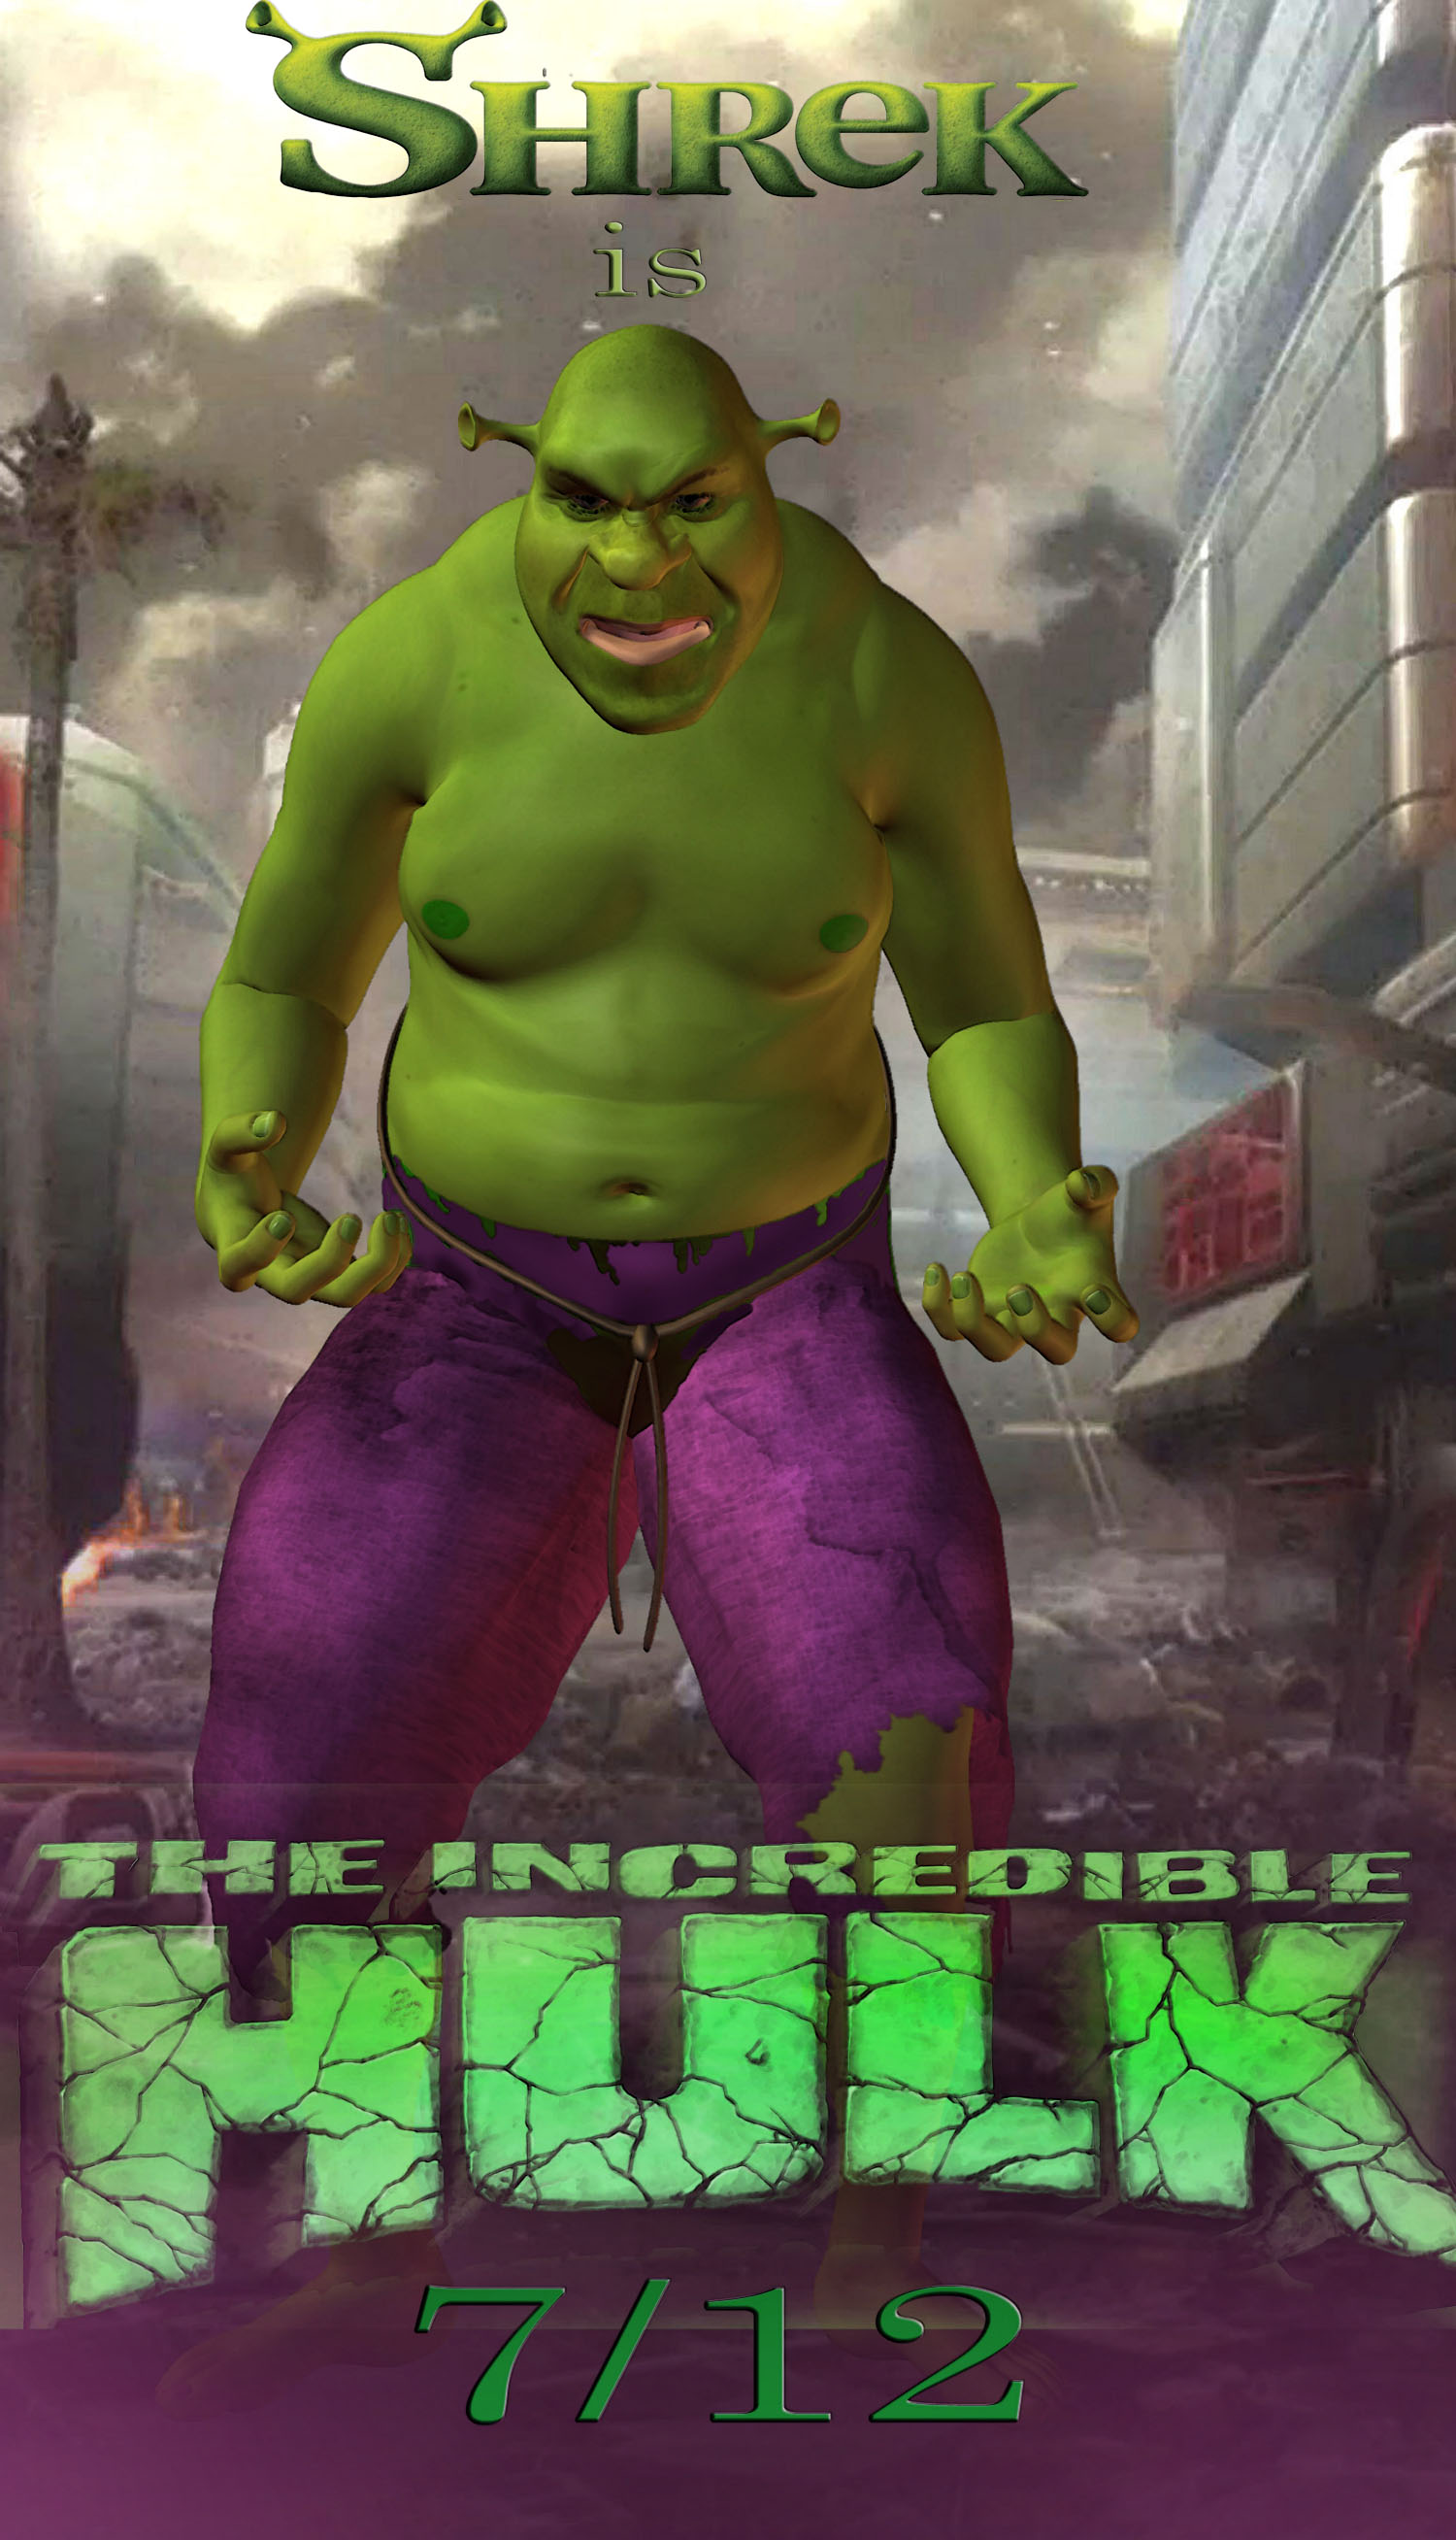 bad casting...shrek is the hulk